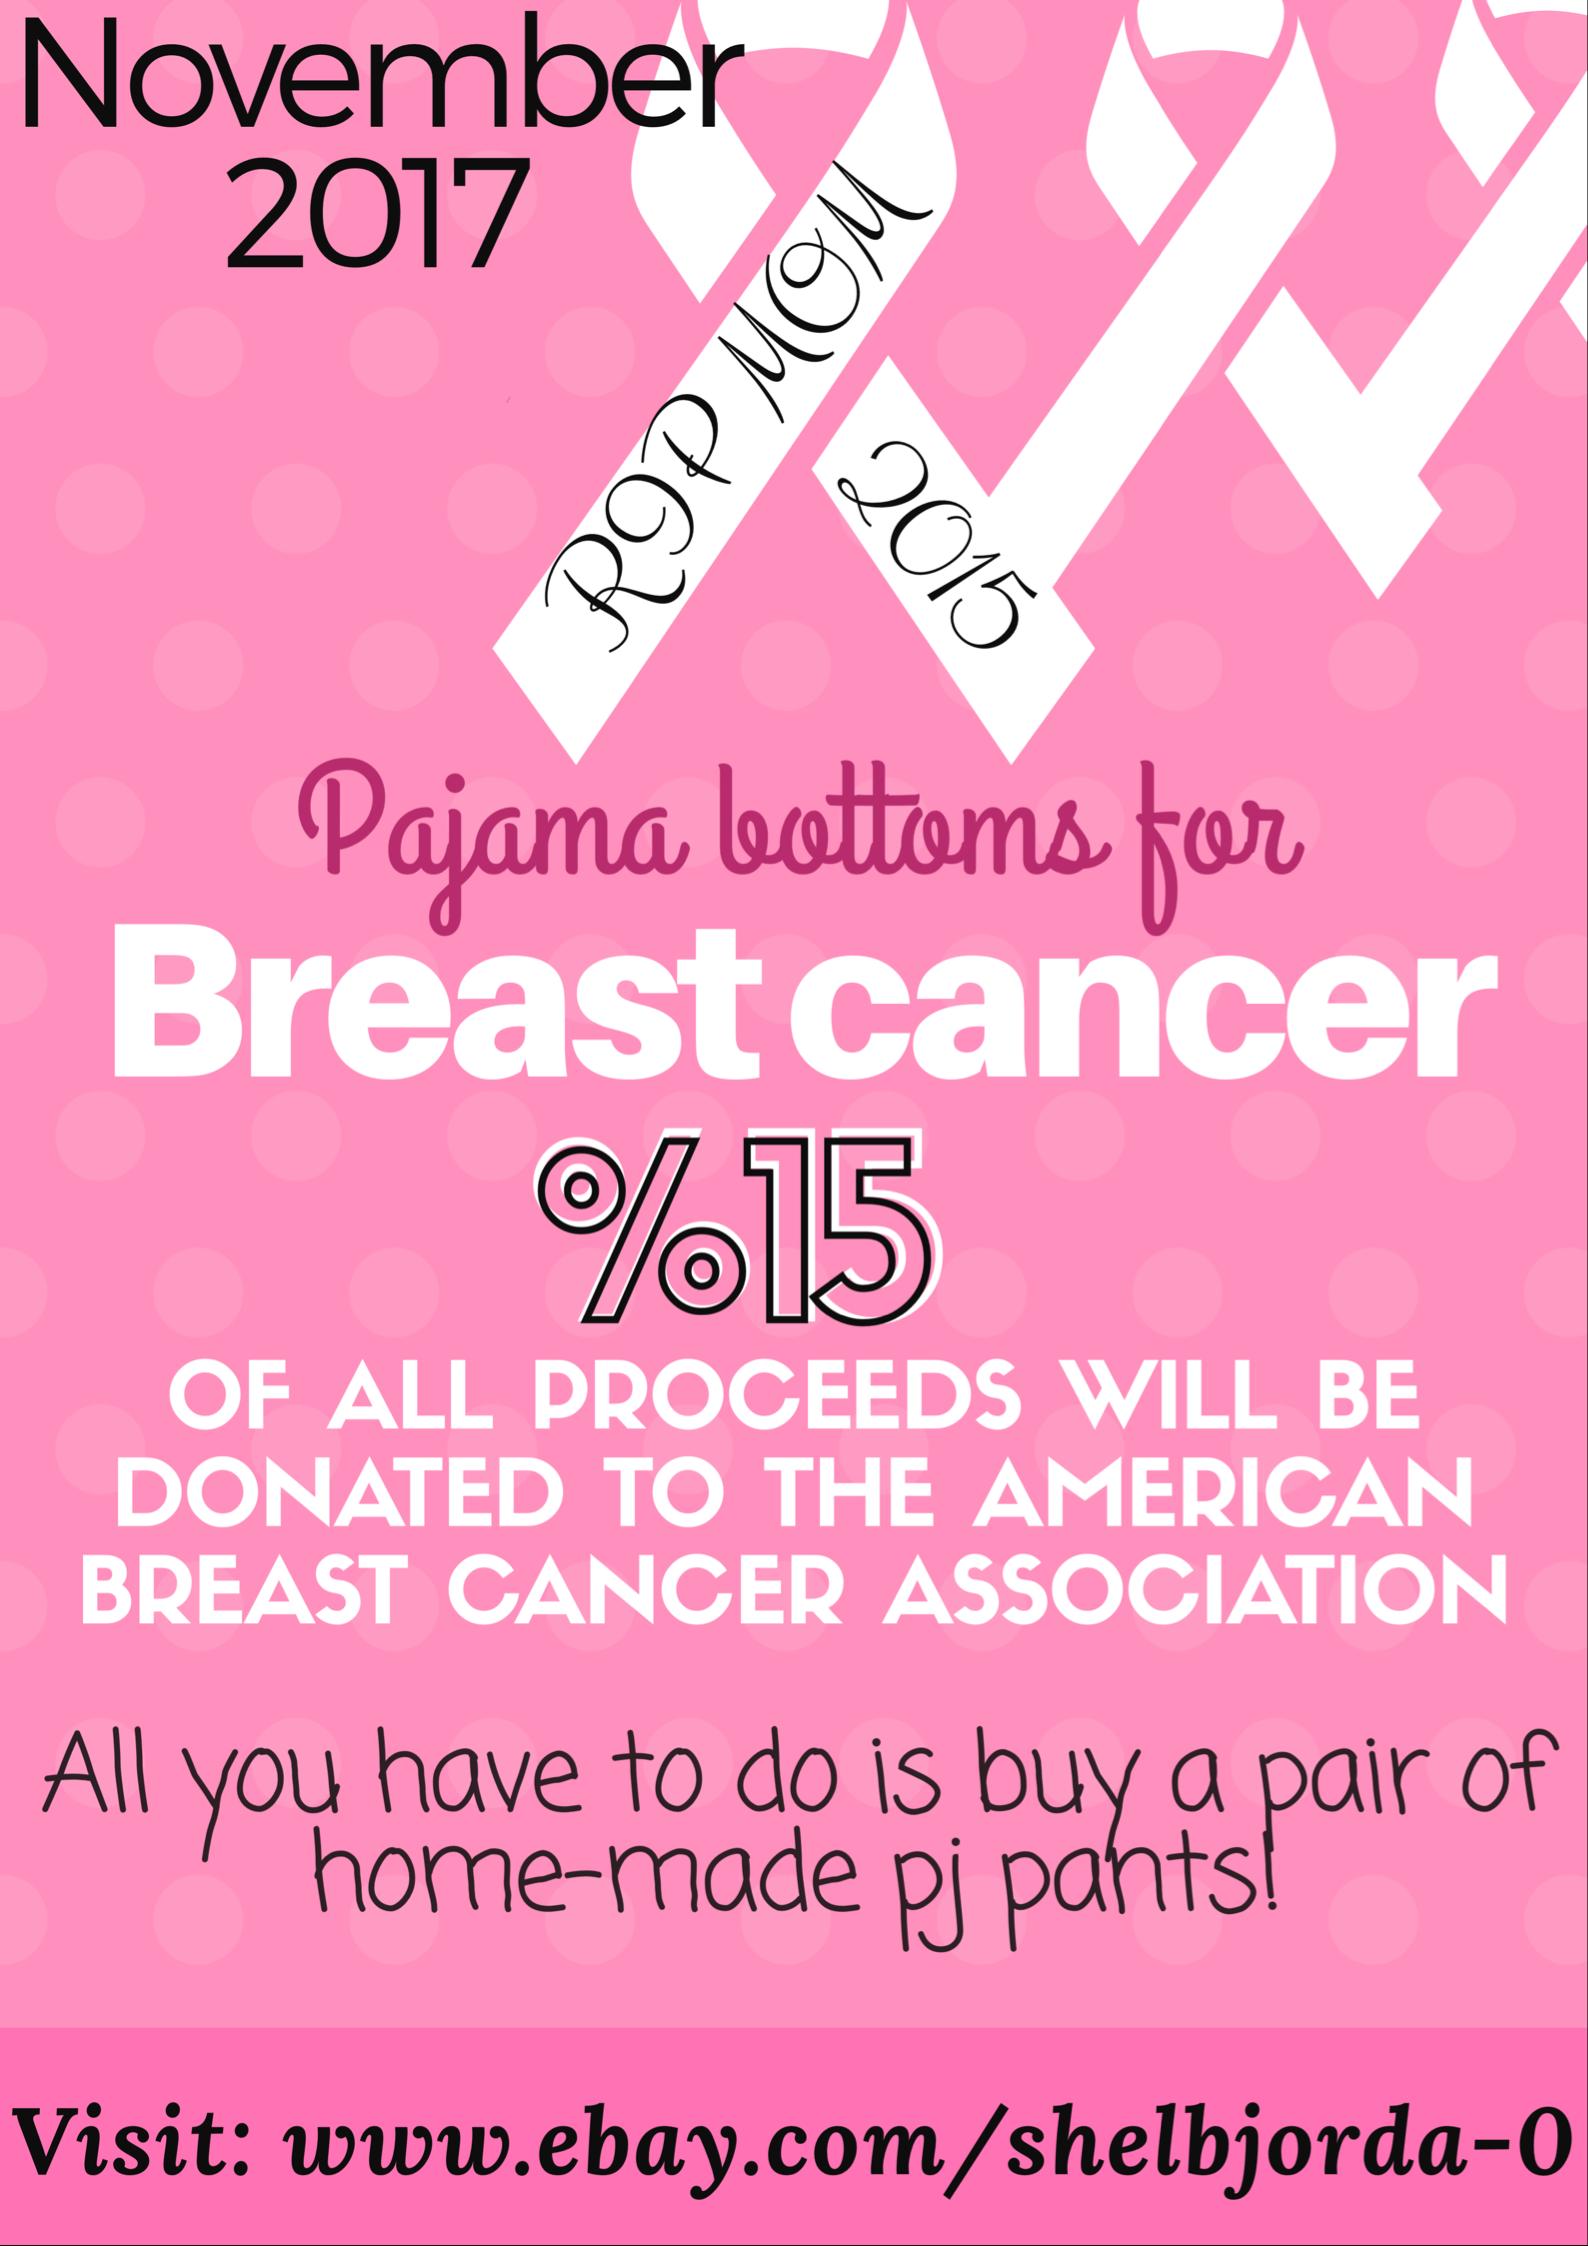 American breast cancer assoc